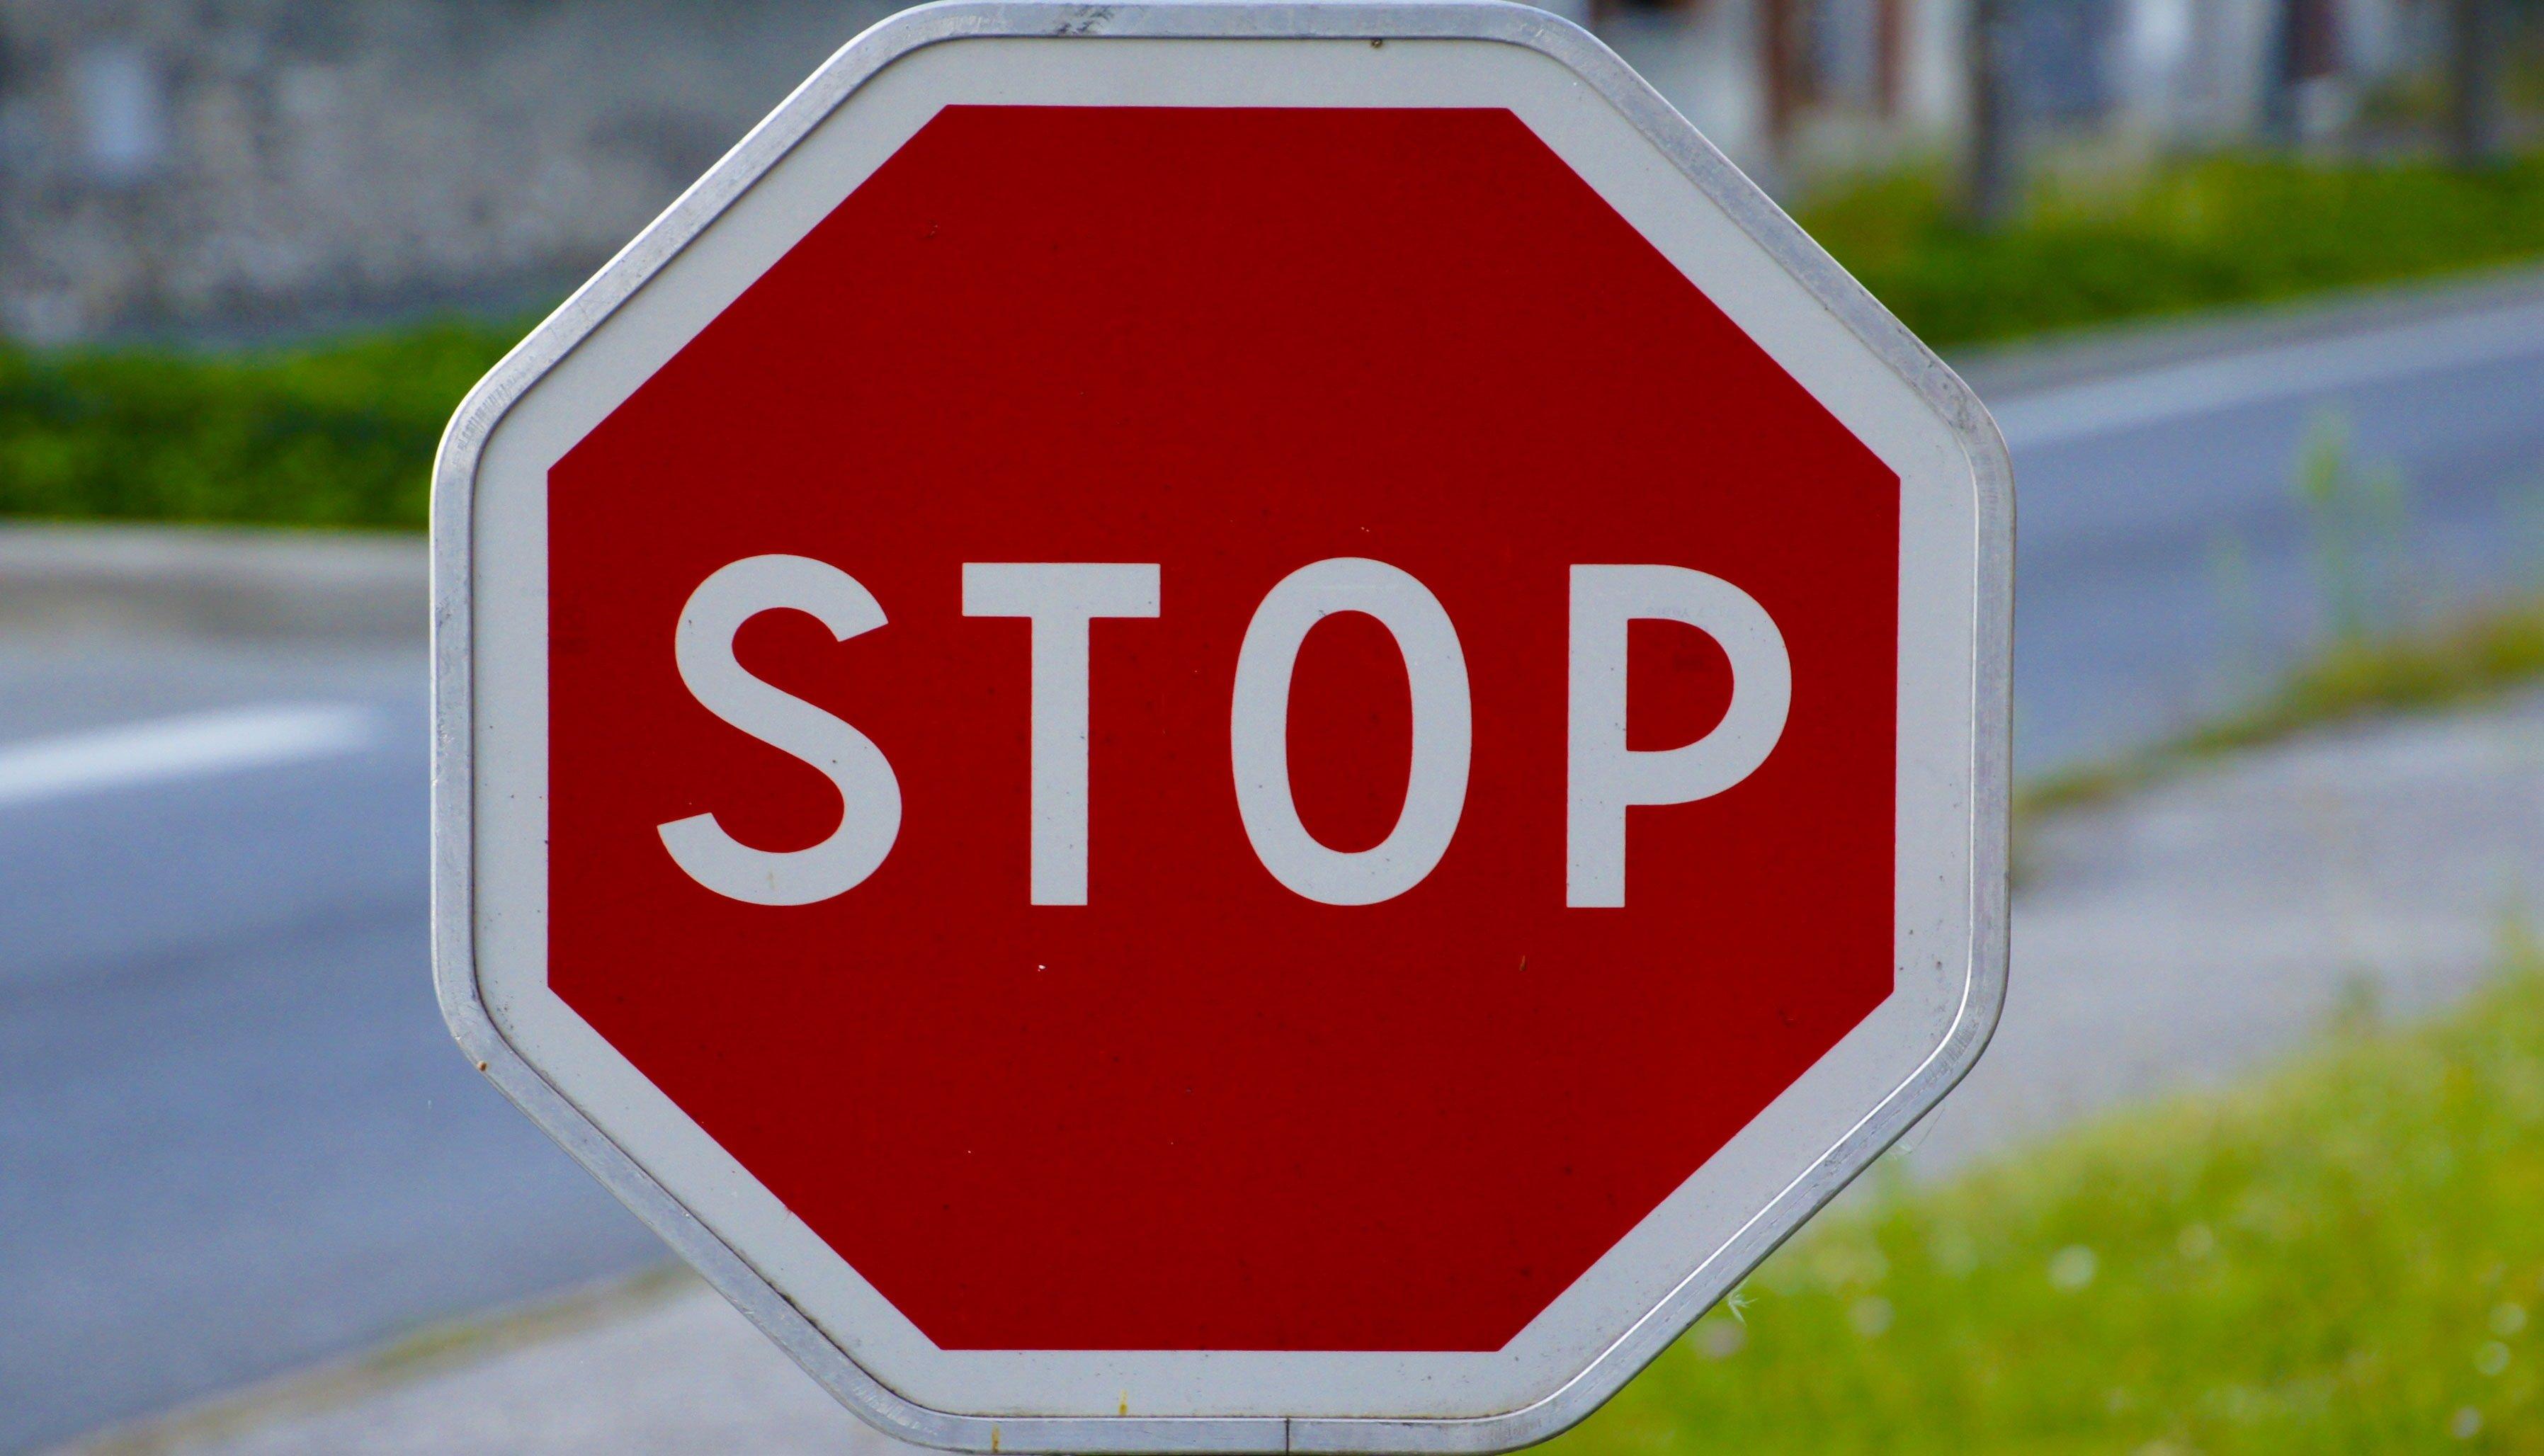 Panel Stop Signalling Road Traffic Wallpaper